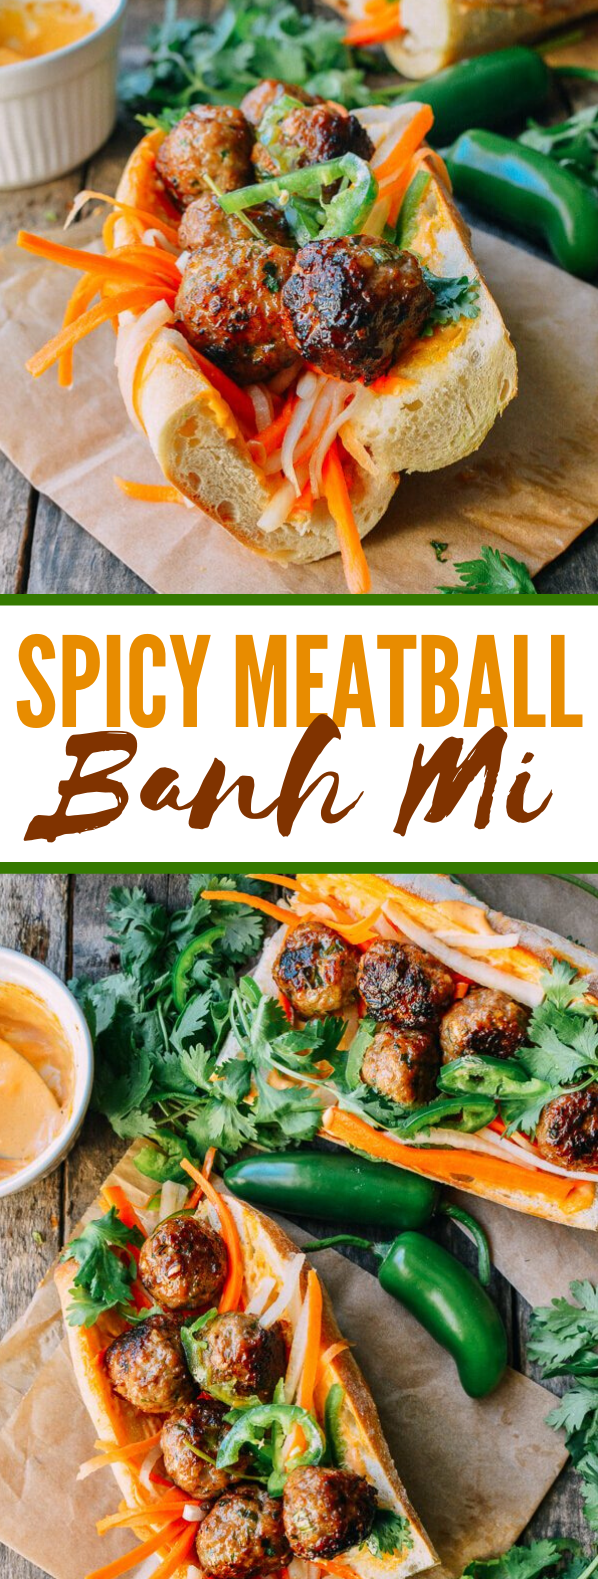 Meatball Banh Mi #dinner #lunch